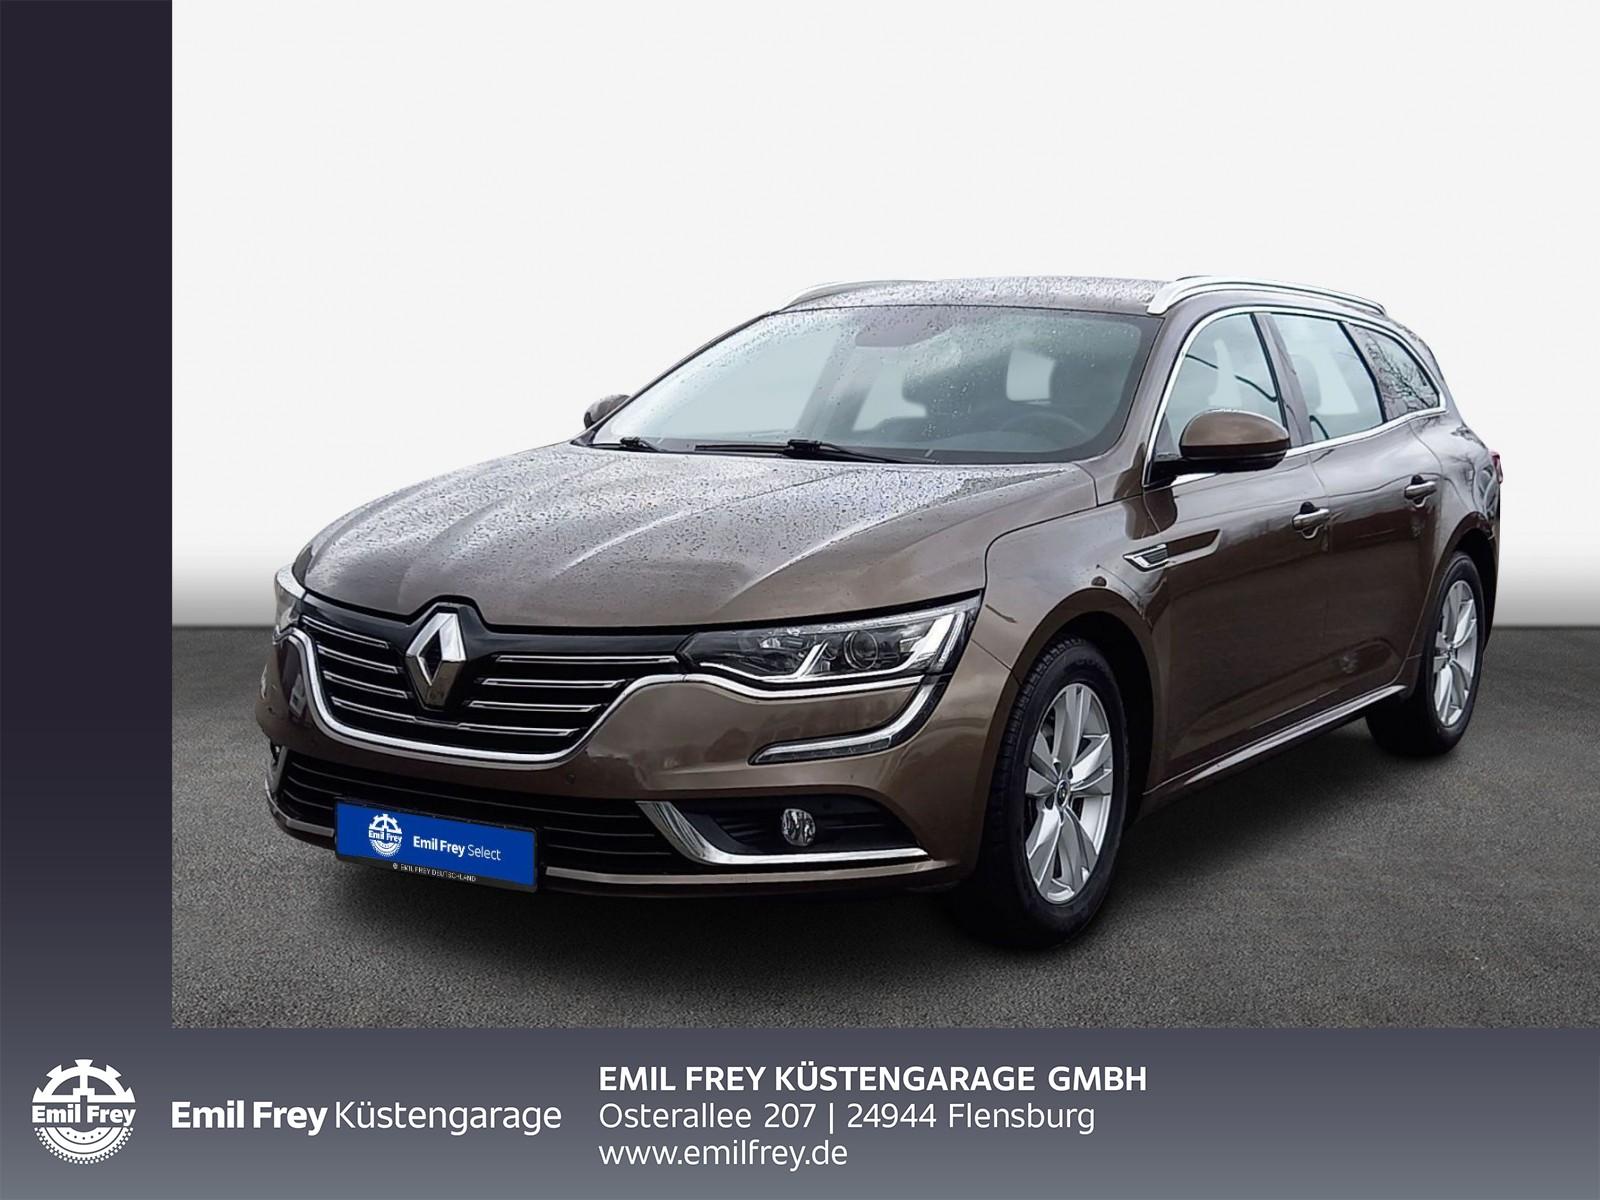 Renault Talisman Grandtour ENERGY dCi 110 LIFE 6-Gang Klima/ GRA/ Nebelscheinwerfer, Jahr 2016, Diesel